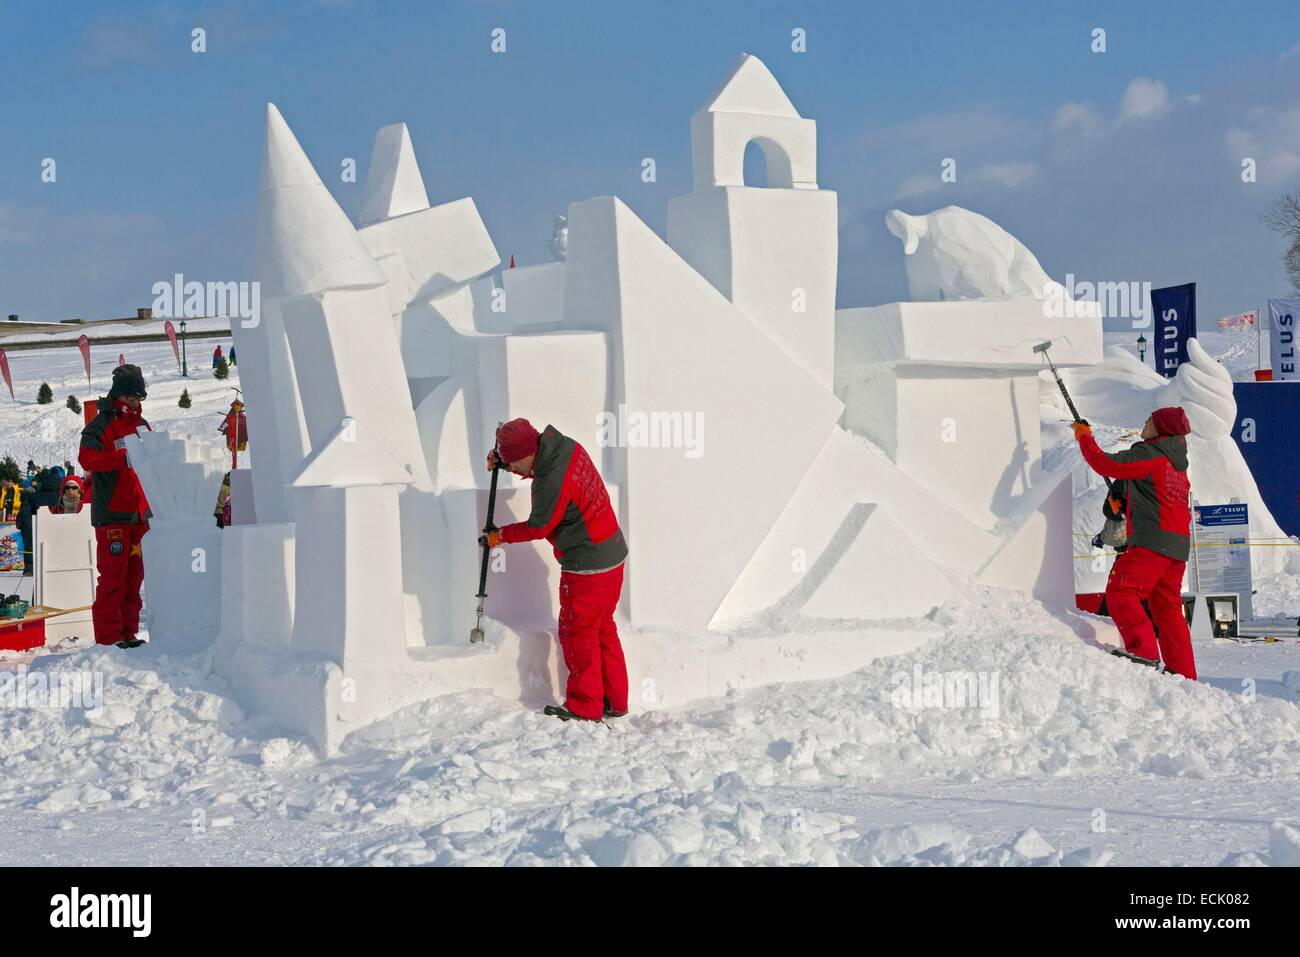 International Snow Sculpture Stock Photos & International Snow ...